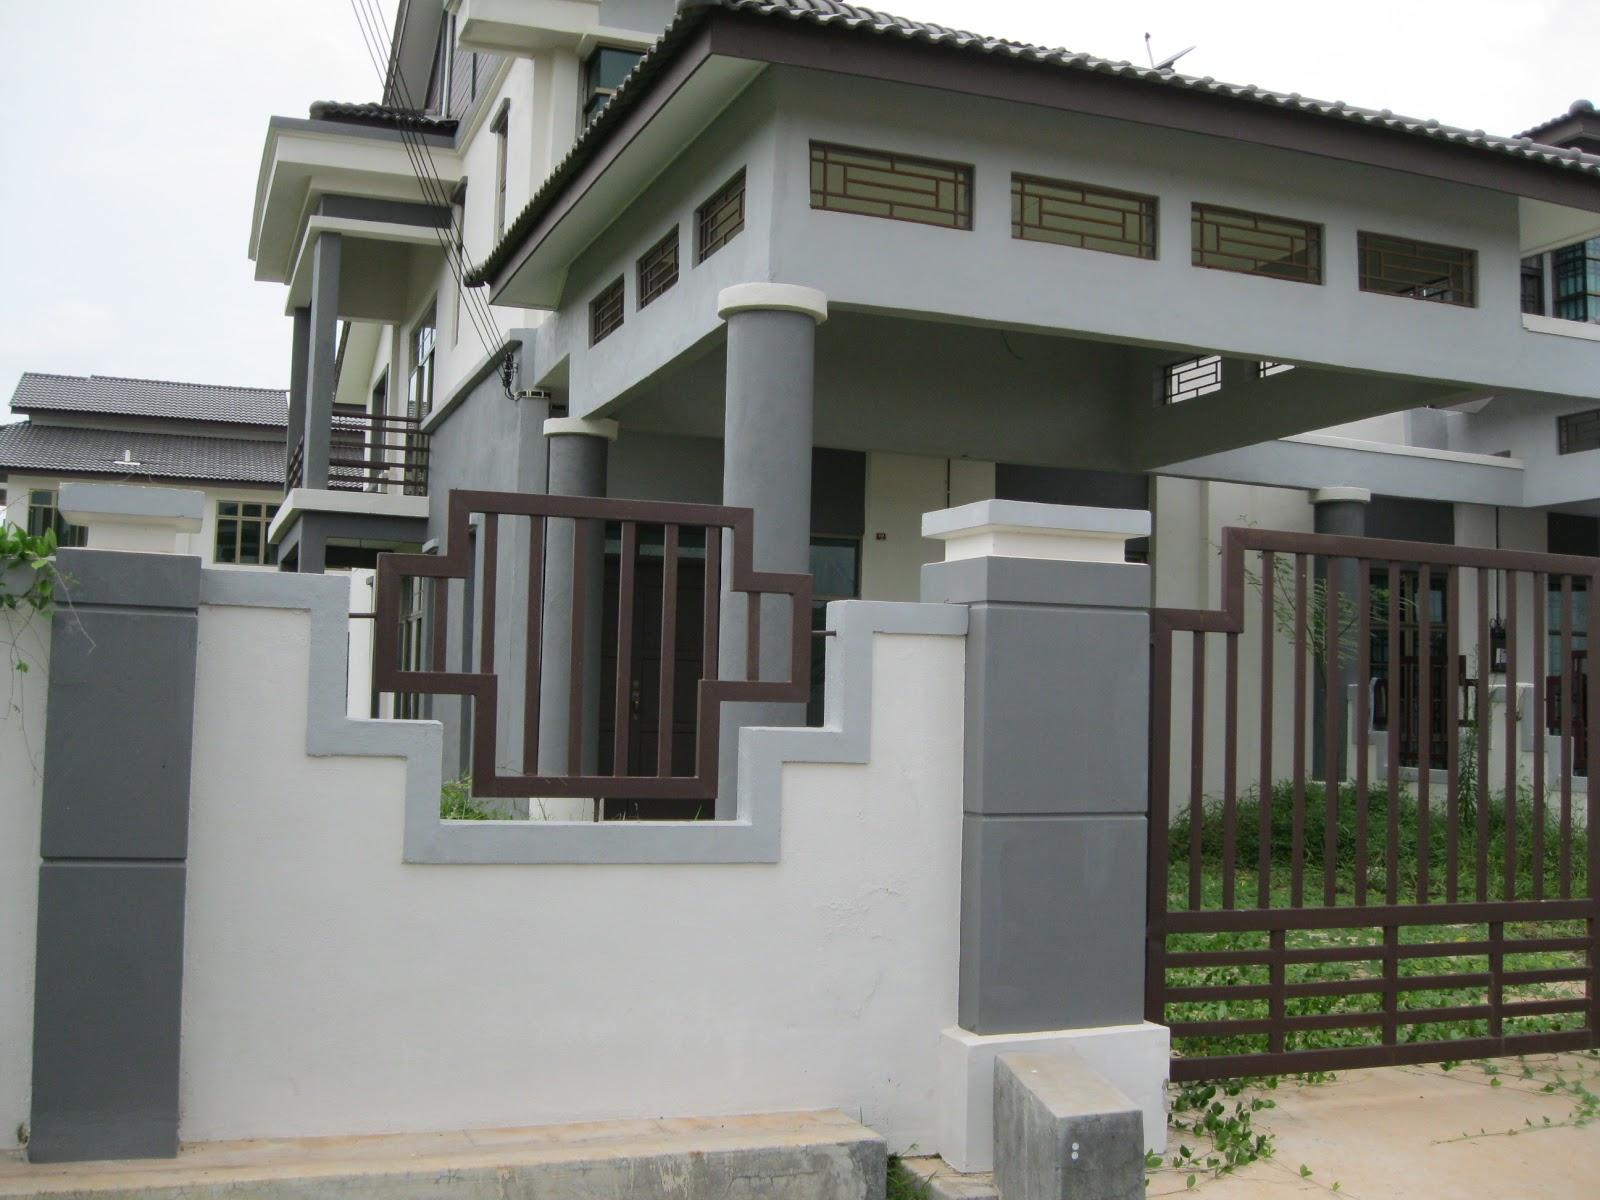 MELAKA NEWLY BUILT Double storey Terrace House CORNER LOT >> FOR SALE